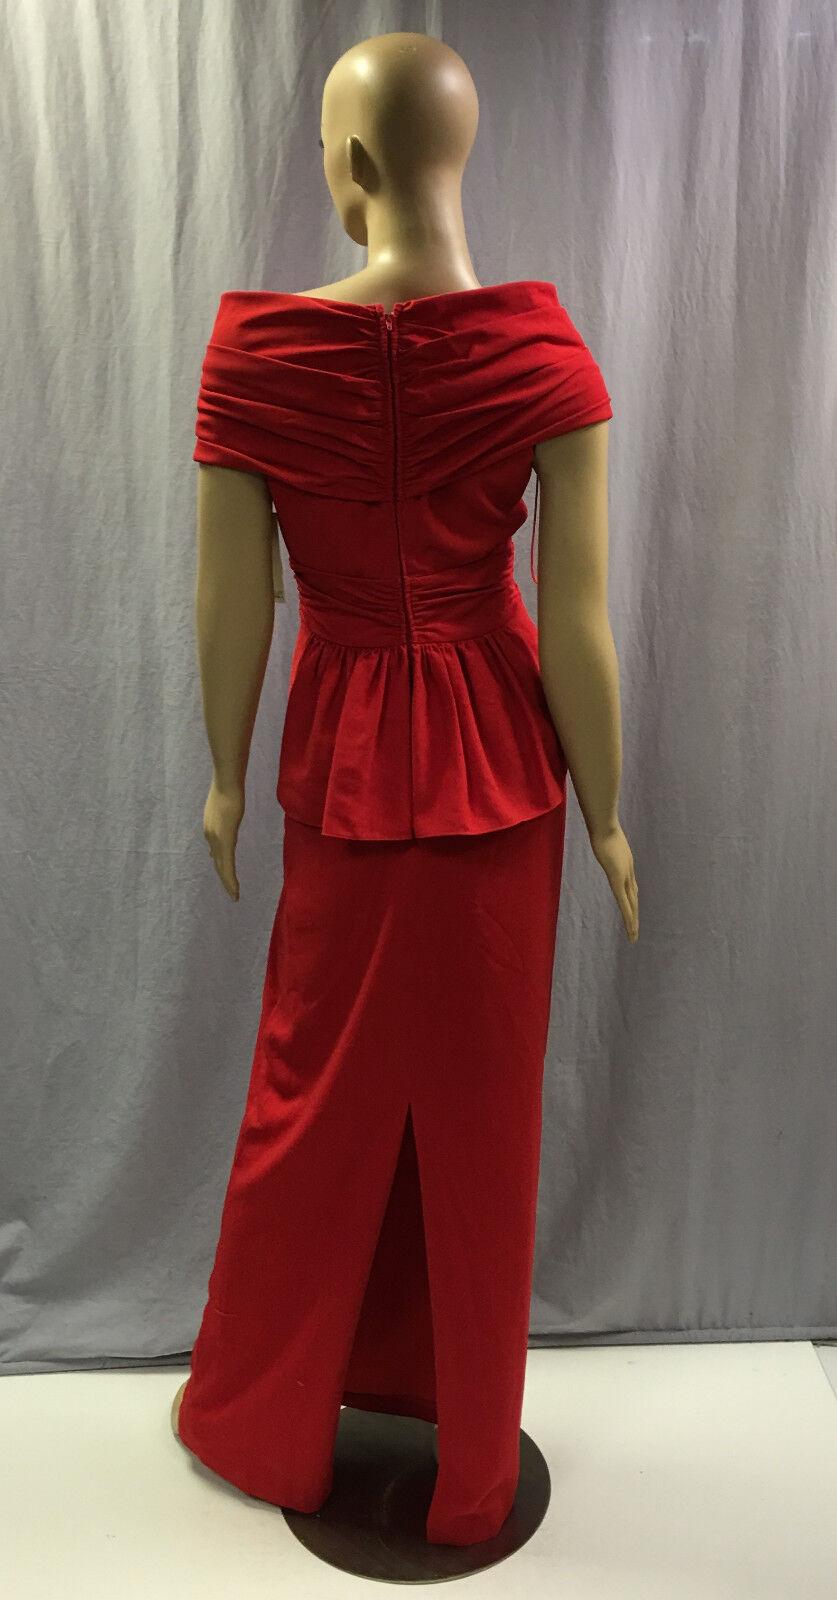 NEW BADGLEY MISCHKA  550 RED PORTRAIT COLLAR COLLAR COLLAR PEPLUM EVENING GOWN DRESS SZ 8 4126ed